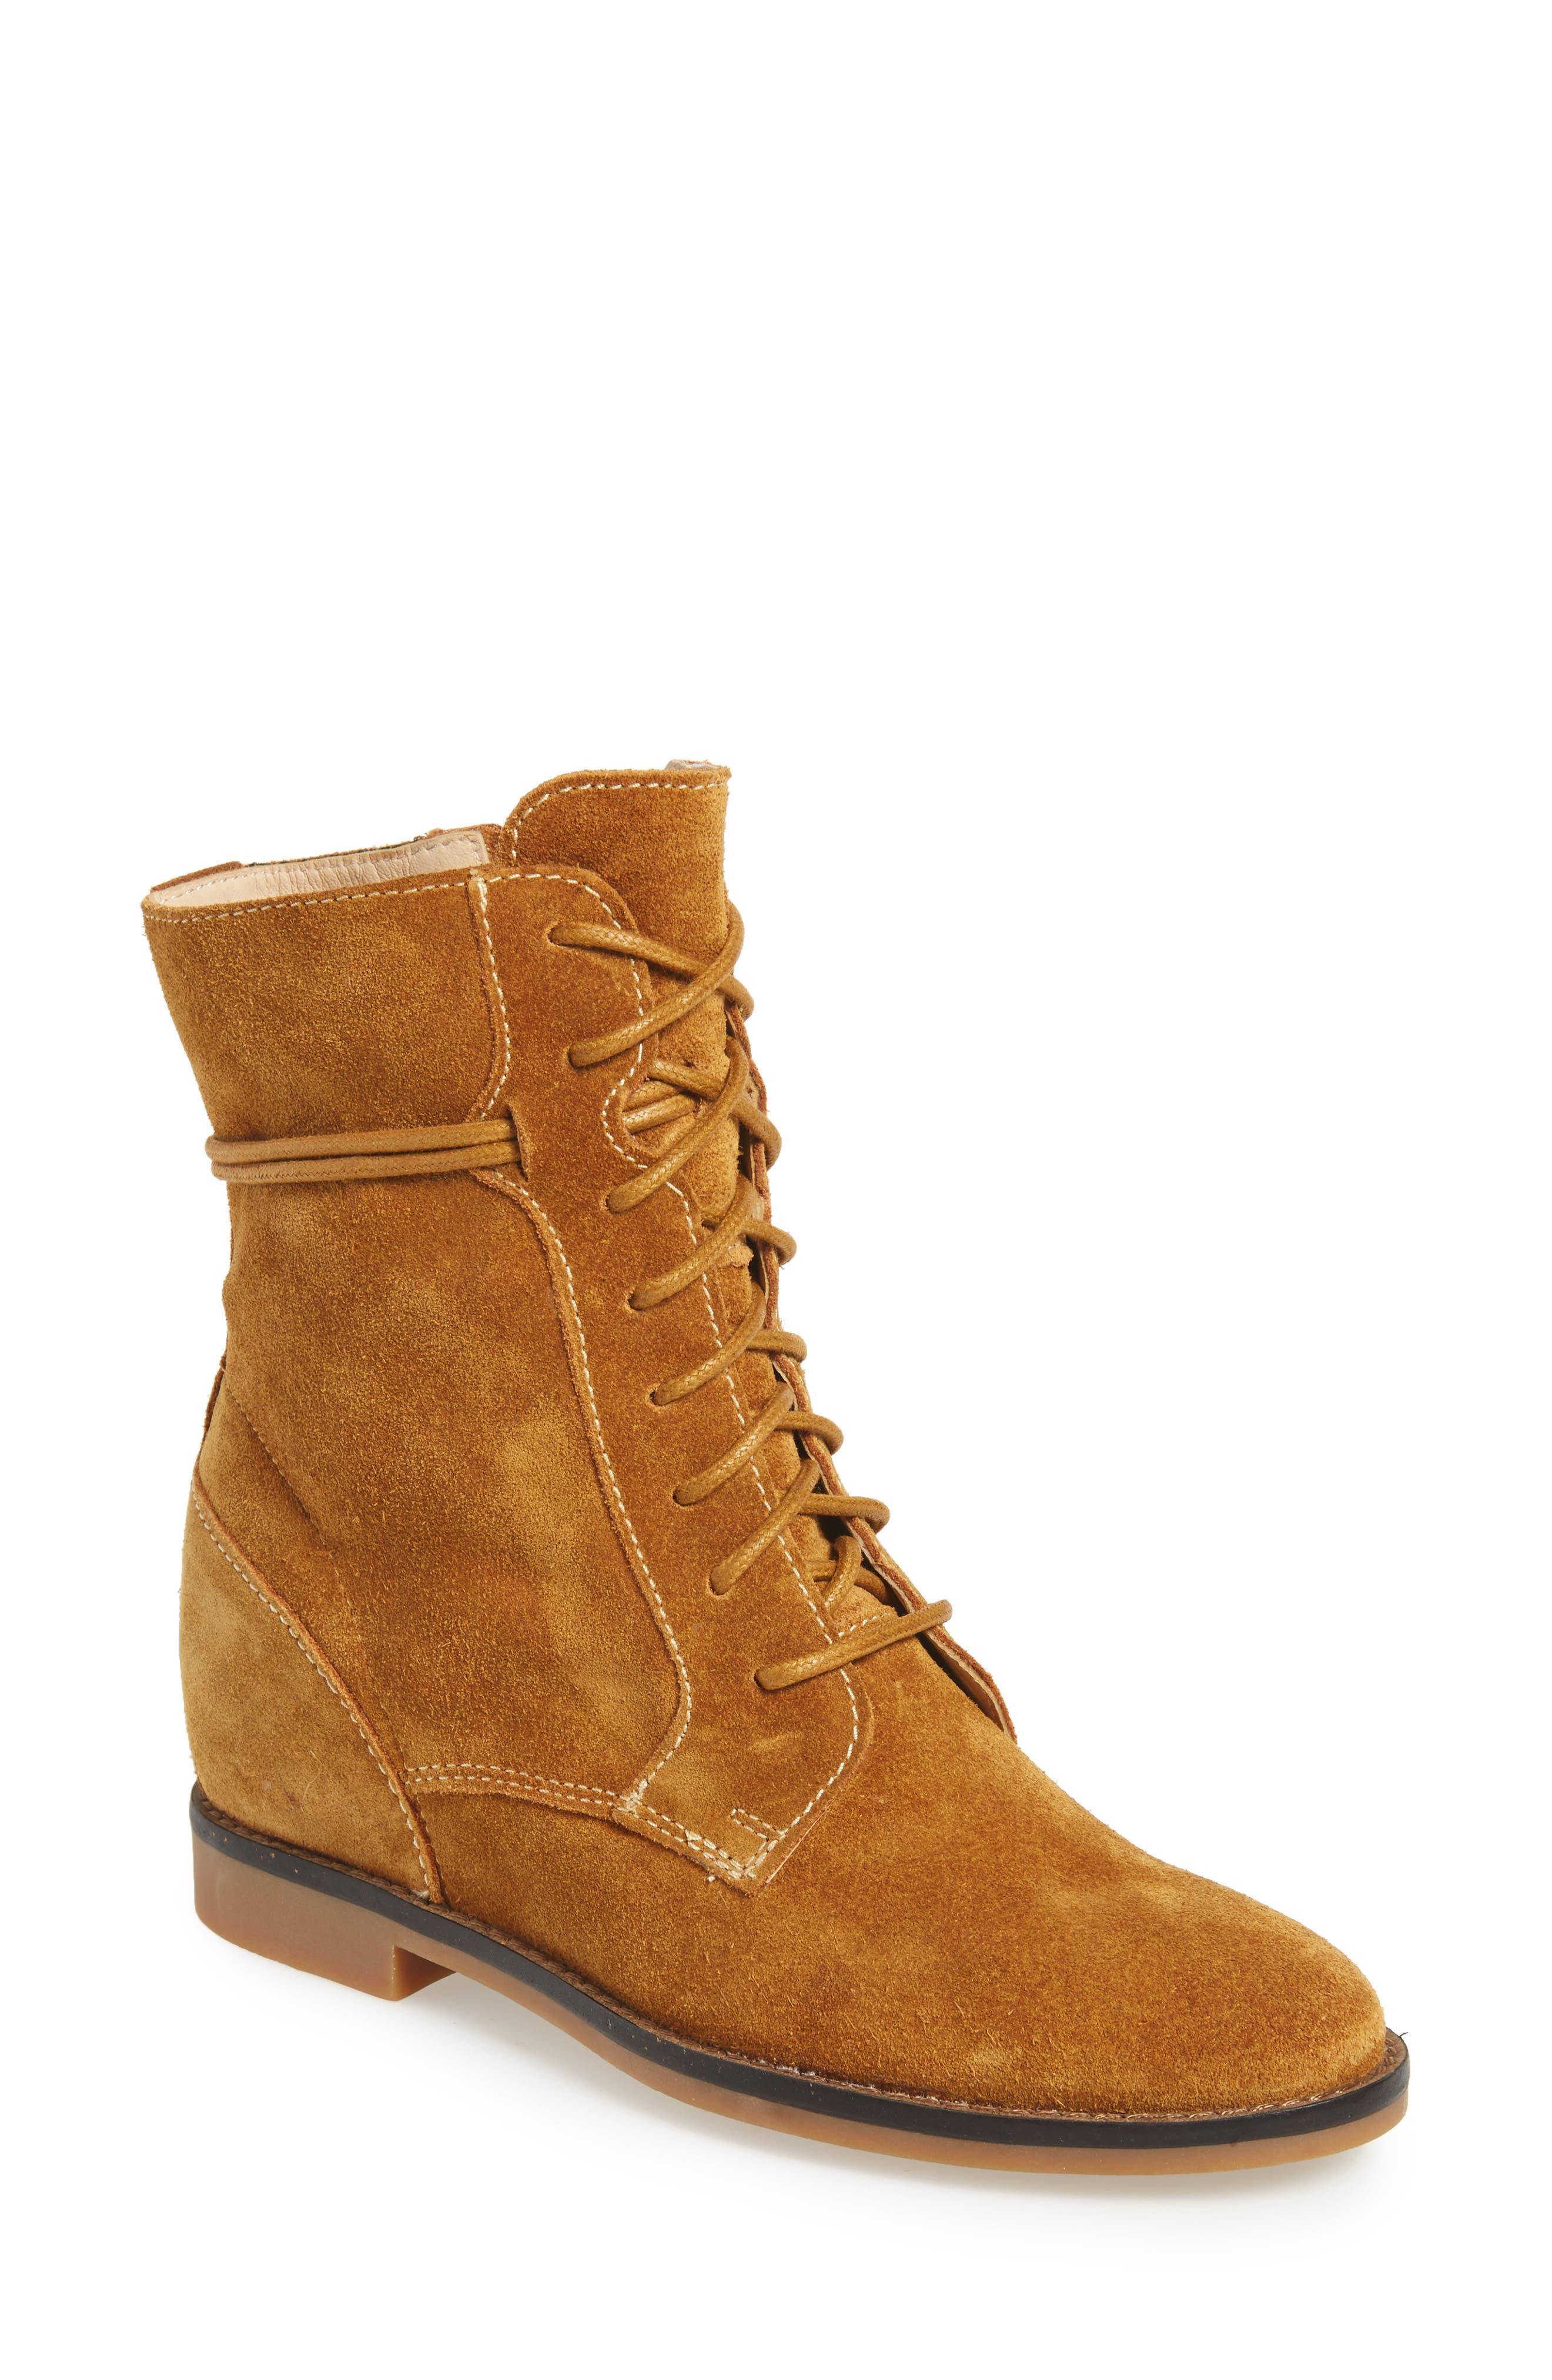 Bab Felise Boot,                             Main thumbnail 1, color,                             Camel Suede